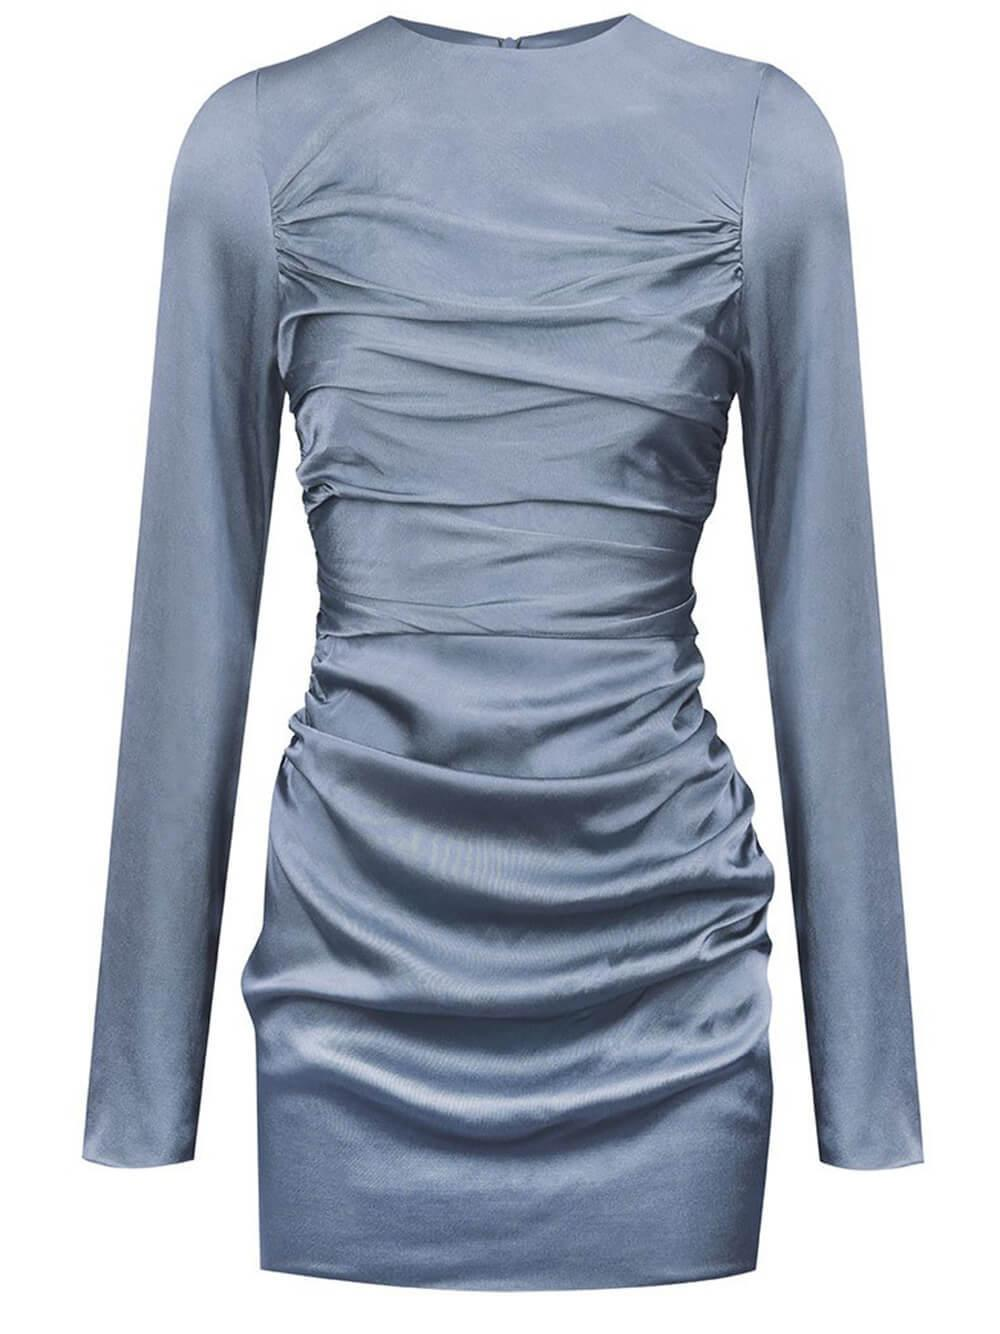 Lily Dress Item # 212029